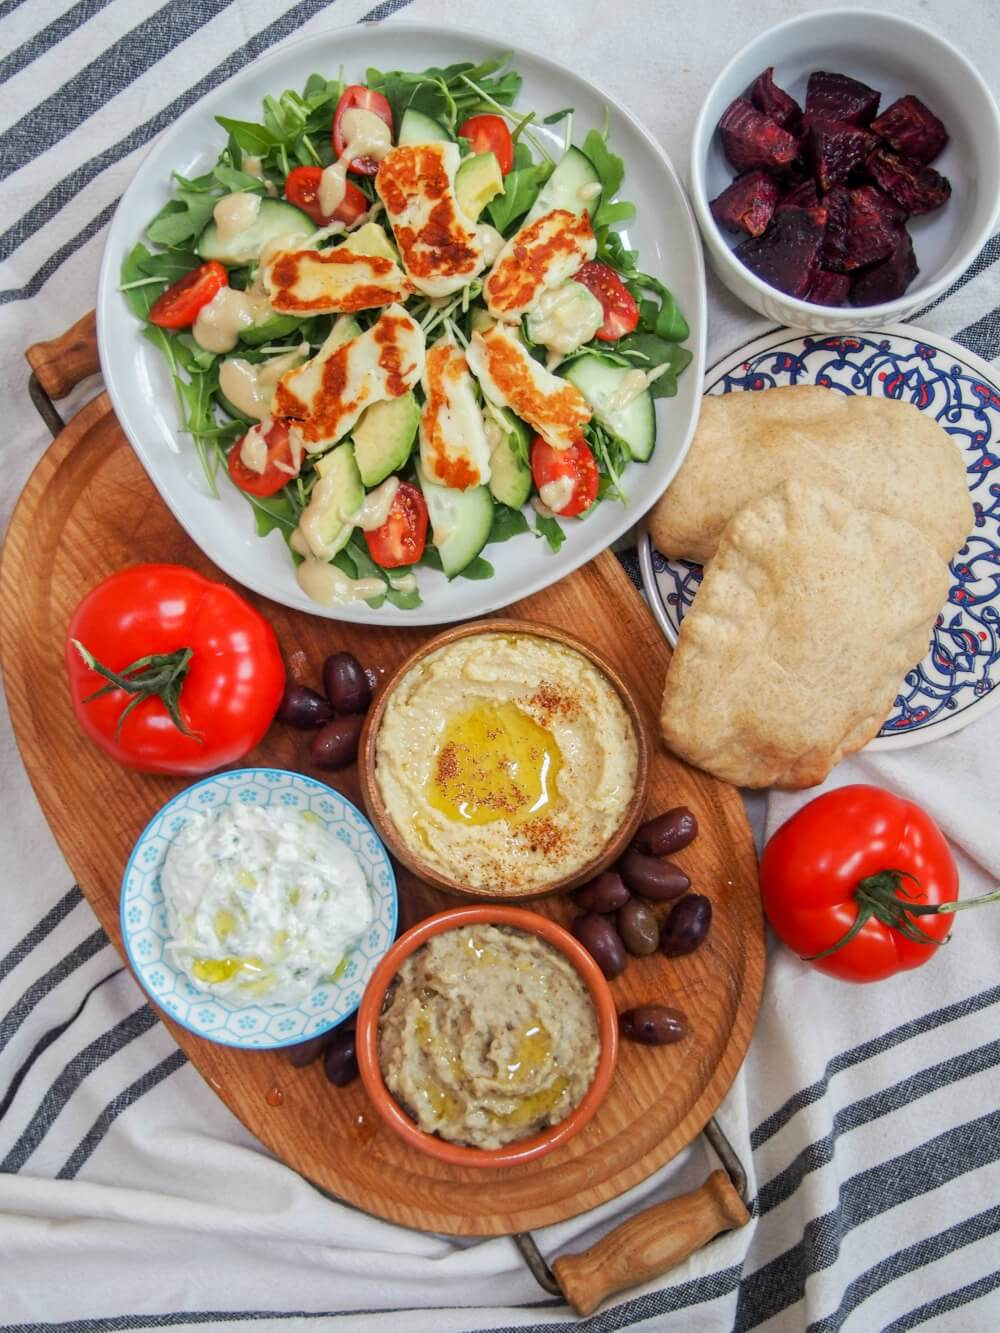 baba ghanoush eggplant dip/spread (baba ganoush) along with hummus, halloumi salad and other mezze